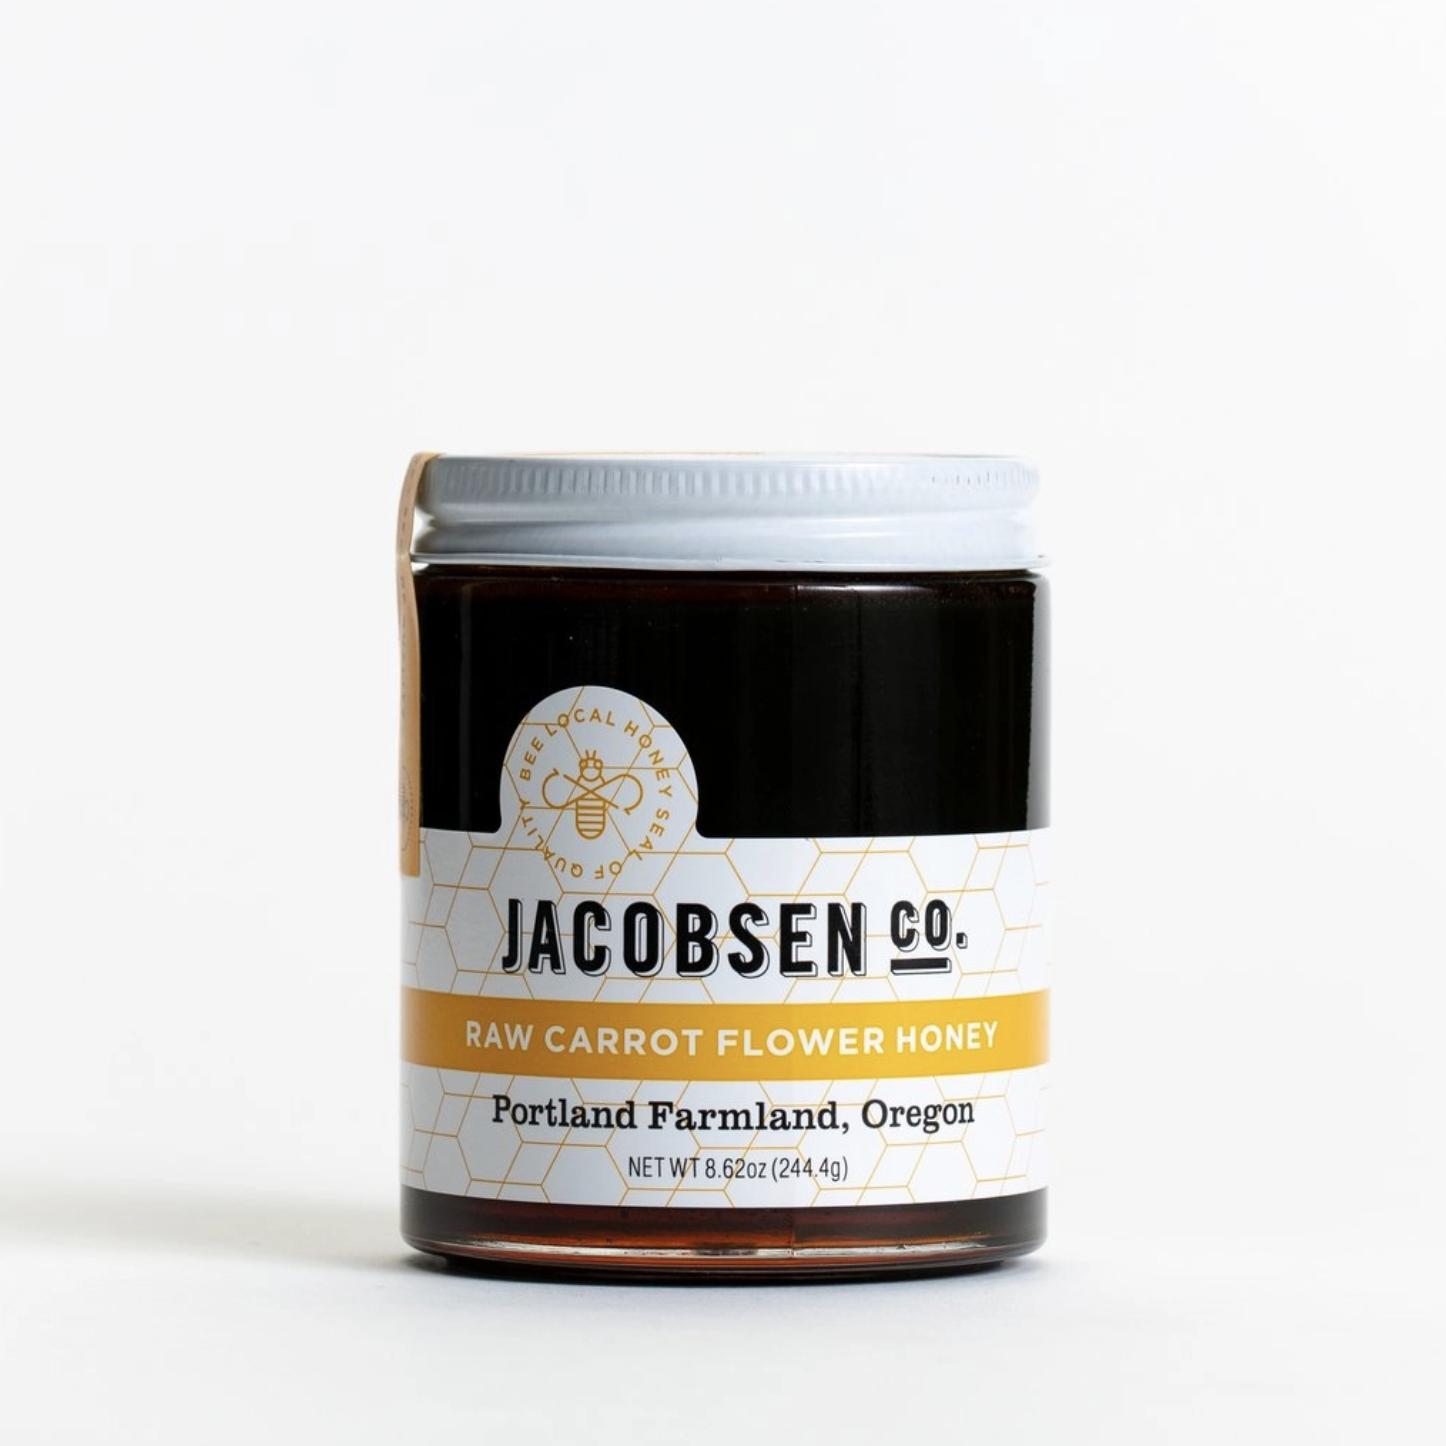 Jacobsen Salt Co. Raw Carrot Flower Honey 8.62oz Jar